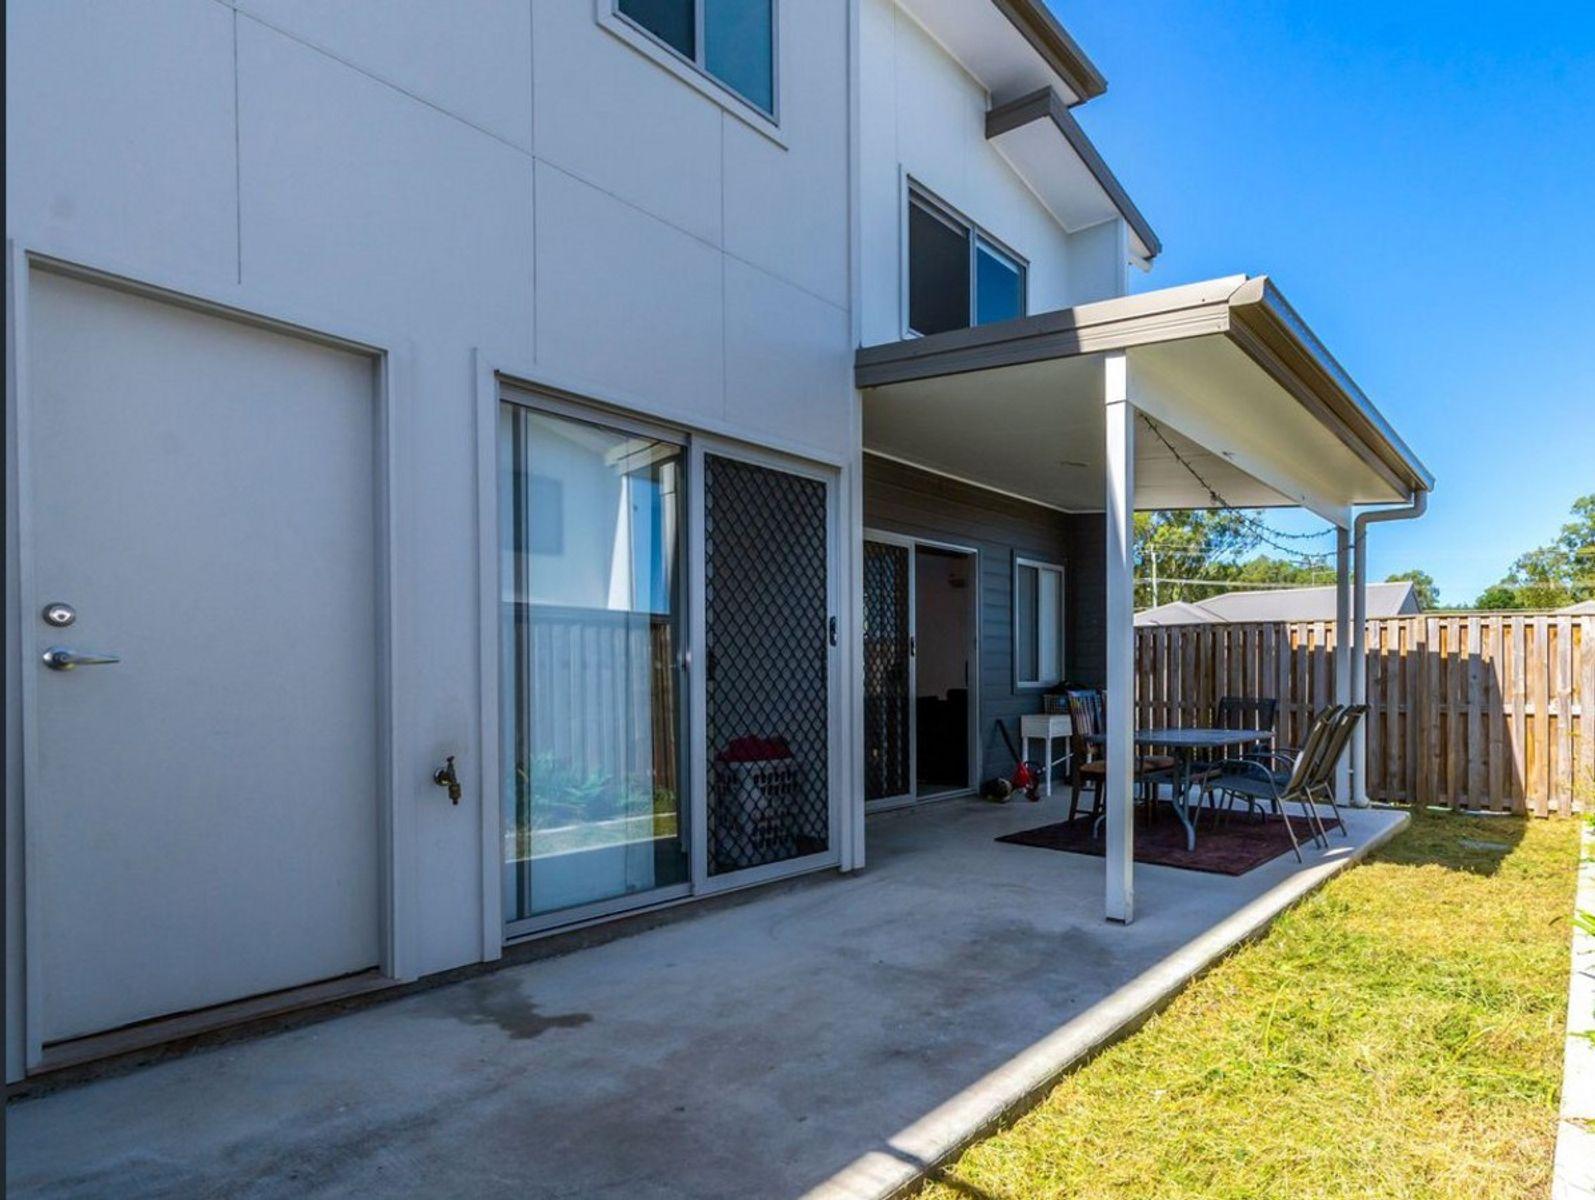 19/70 Willow, Redbank Plains, QLD 4301